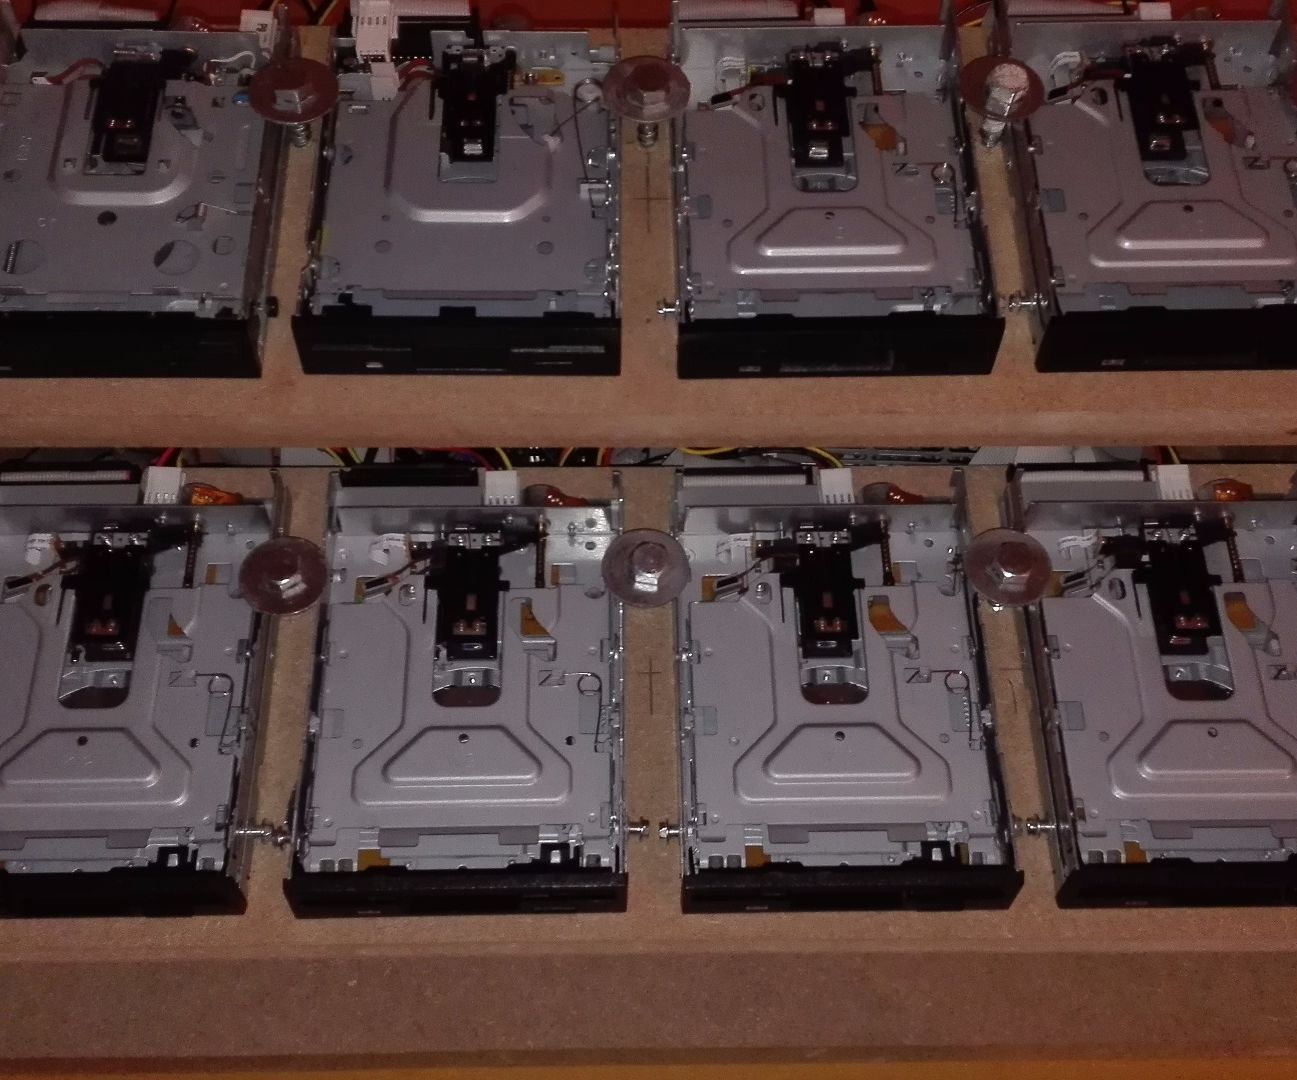 Floppy drive jukebox